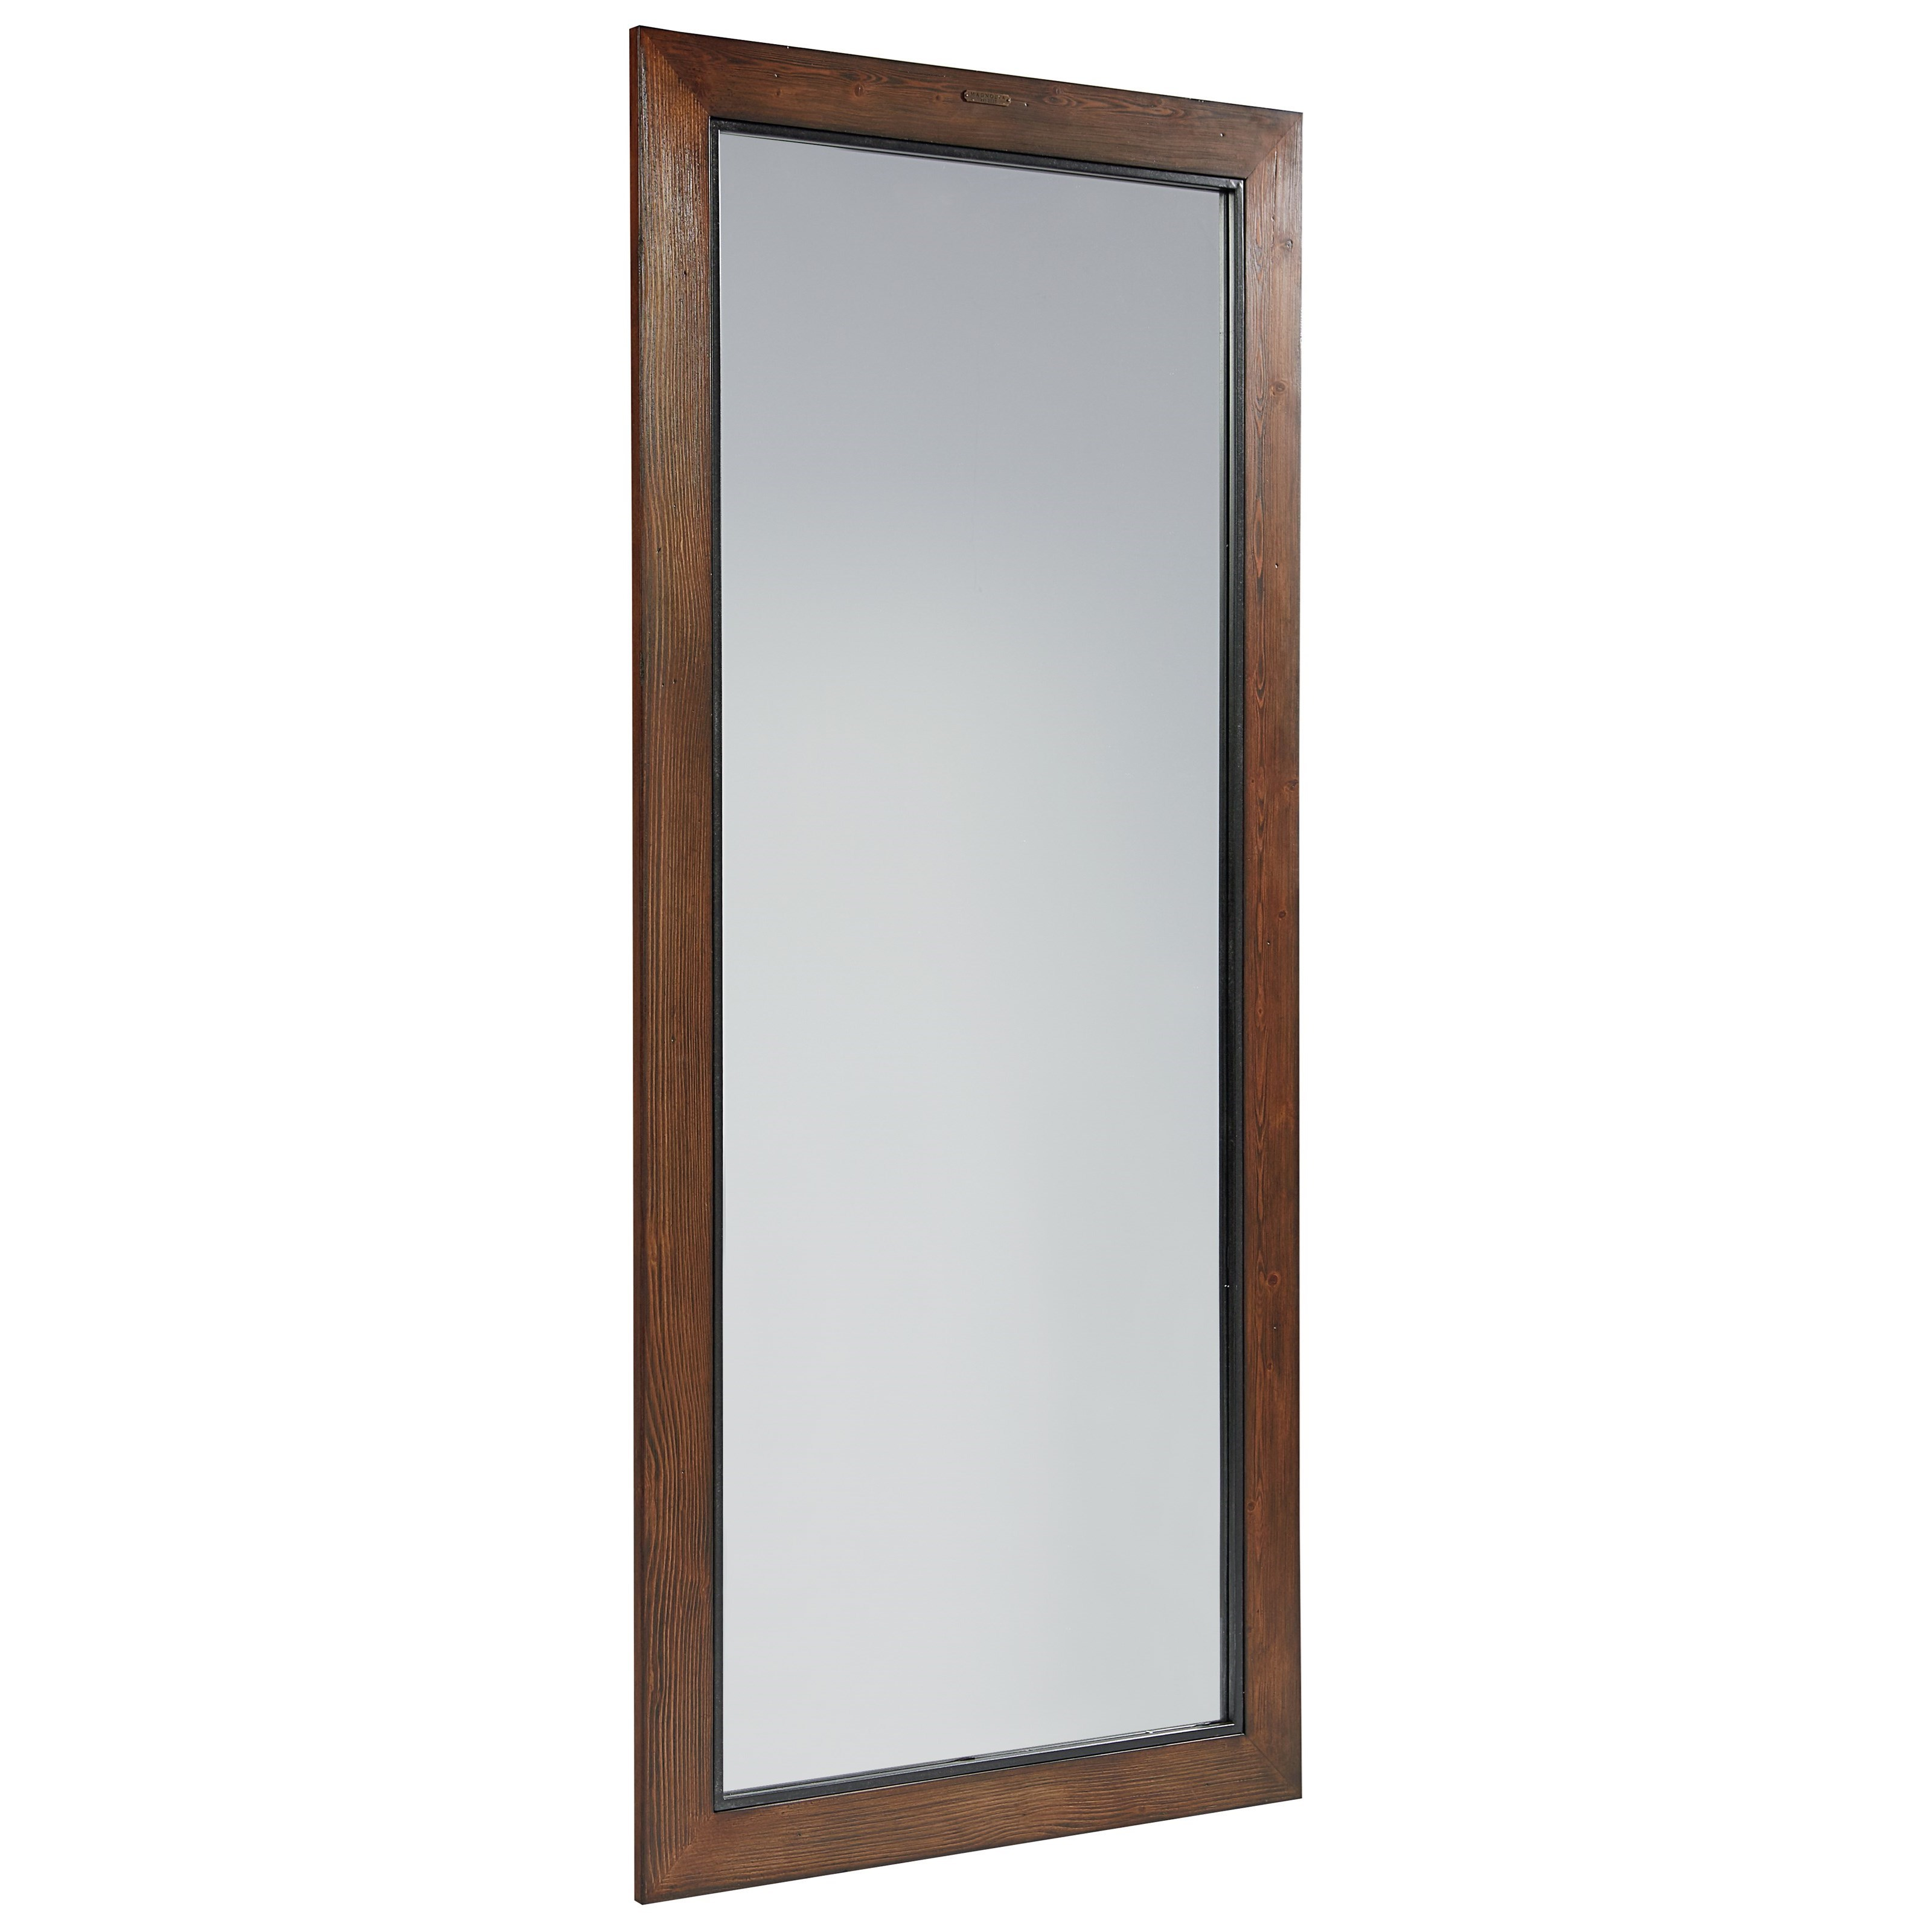 Standing Wood Framed Mirror